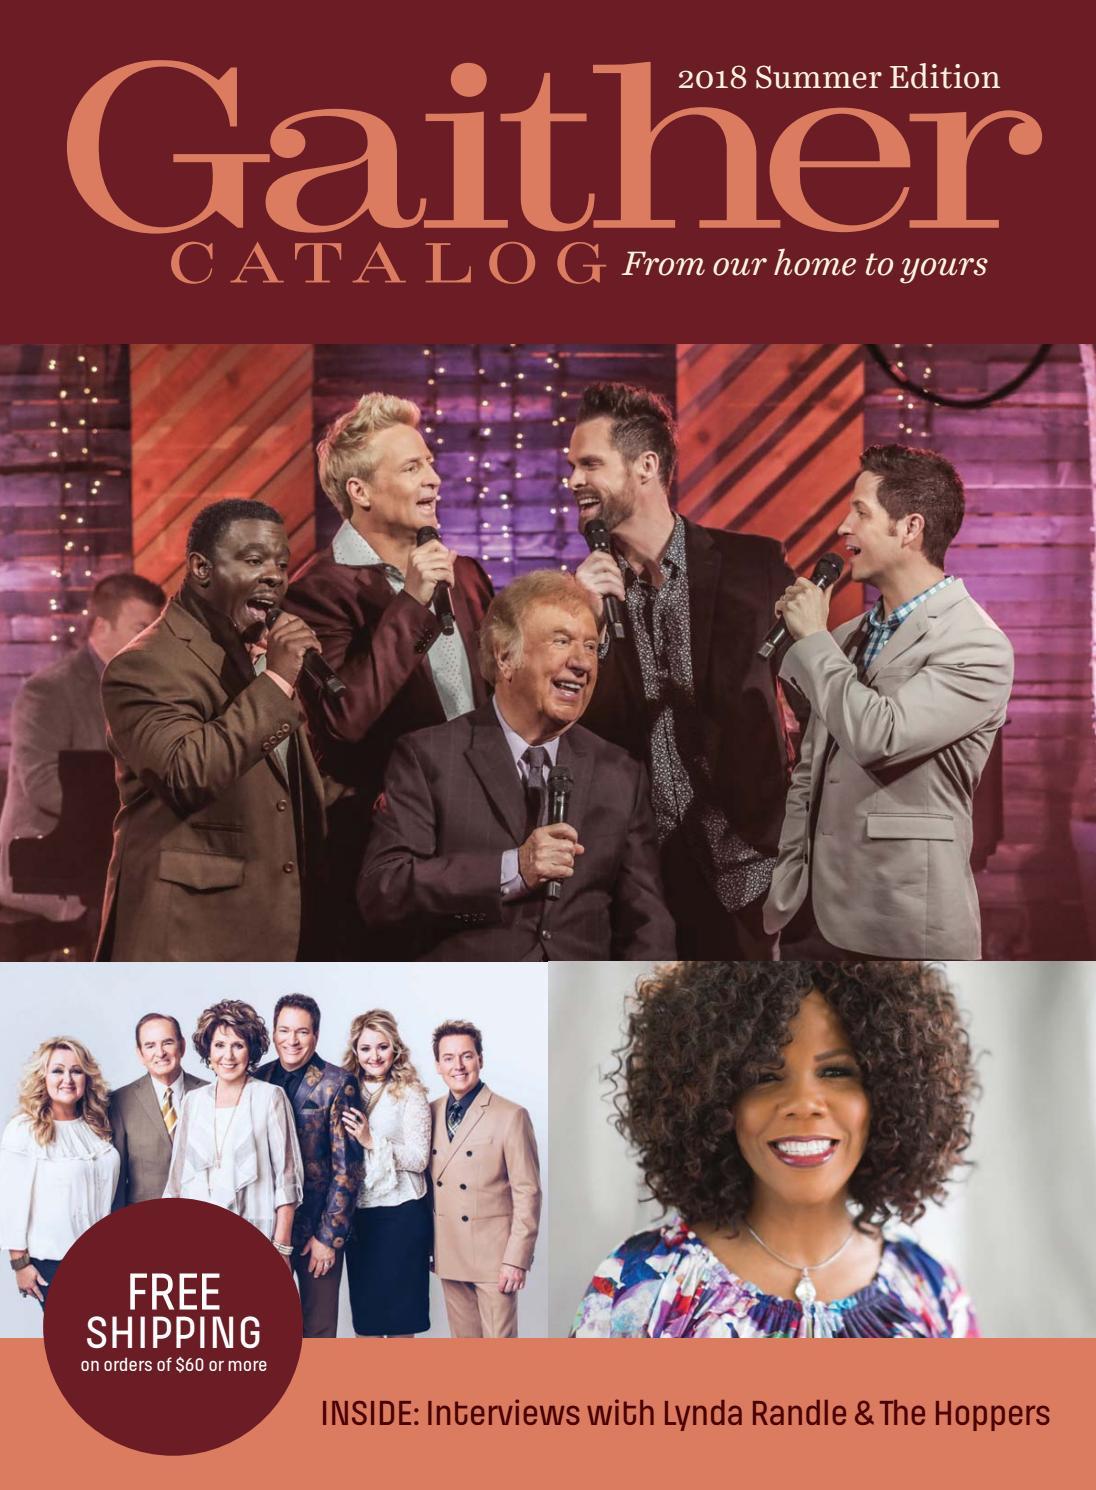 Gaither Summer 2018 Catalog by Susan Kiplinger - issuu